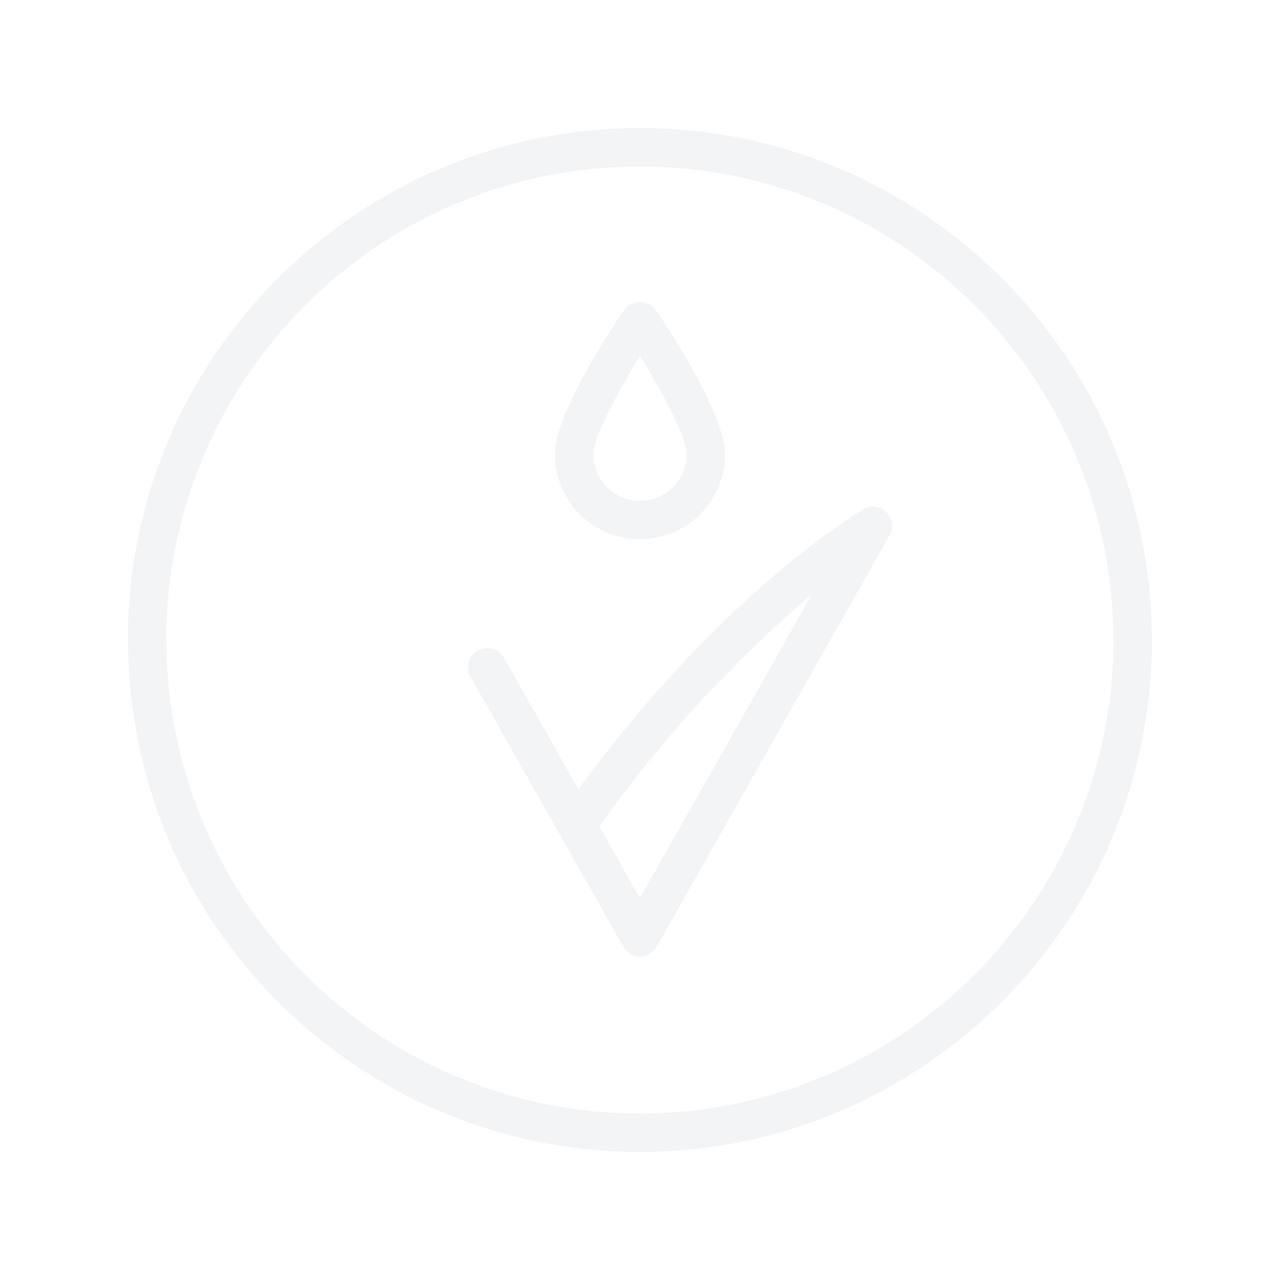 ARTDECO Amazing Effect Mascara No.1 Black 6ml